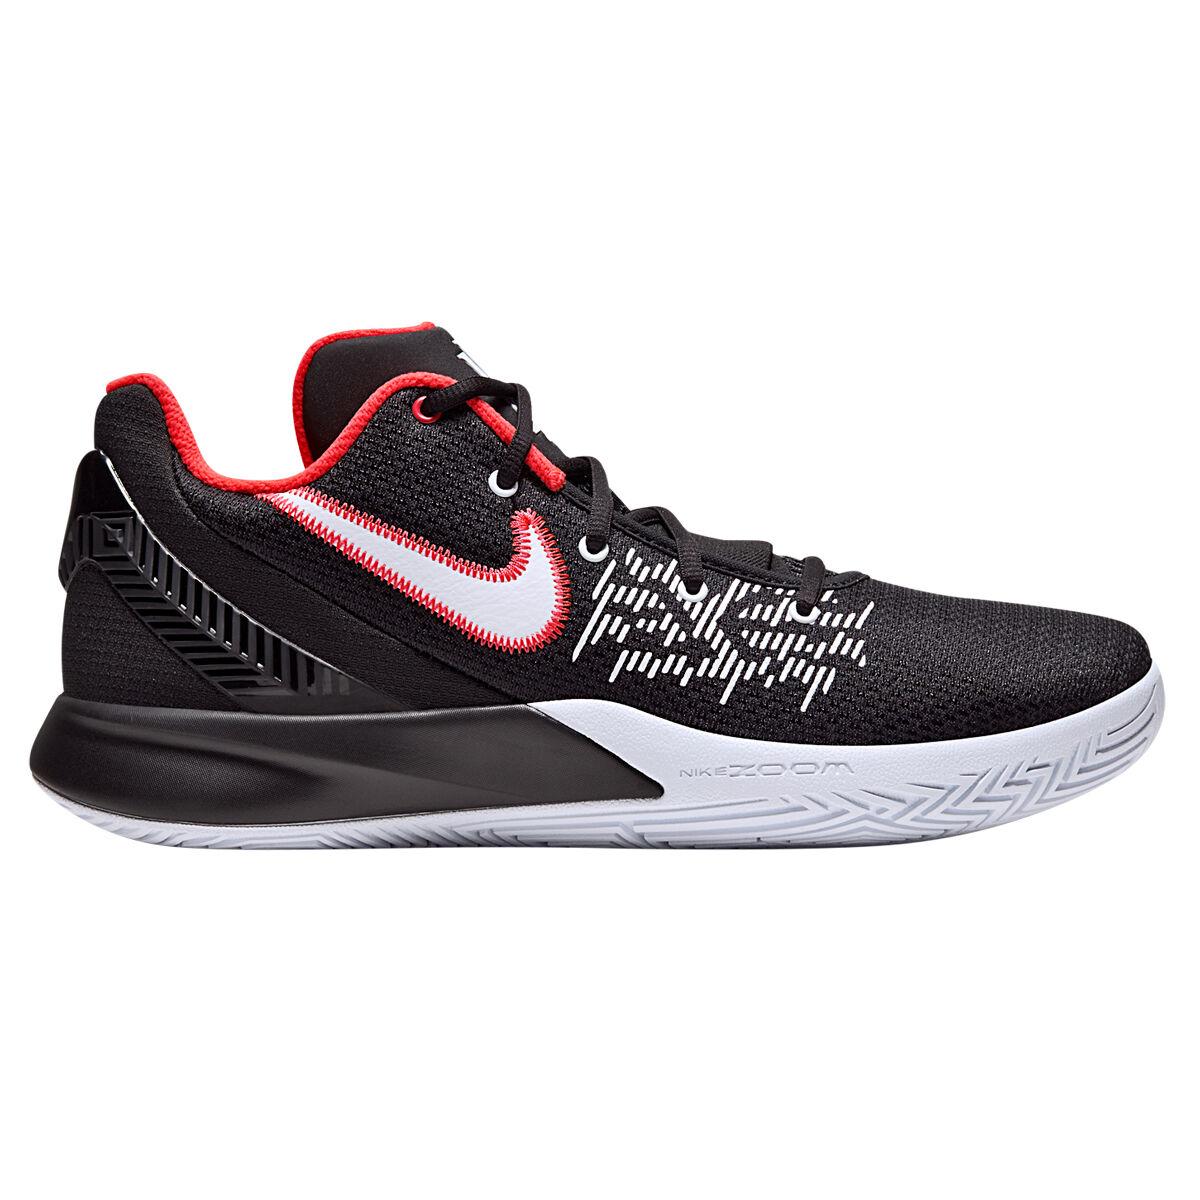 Nike Kyrie Flytrap II Mens Basketball